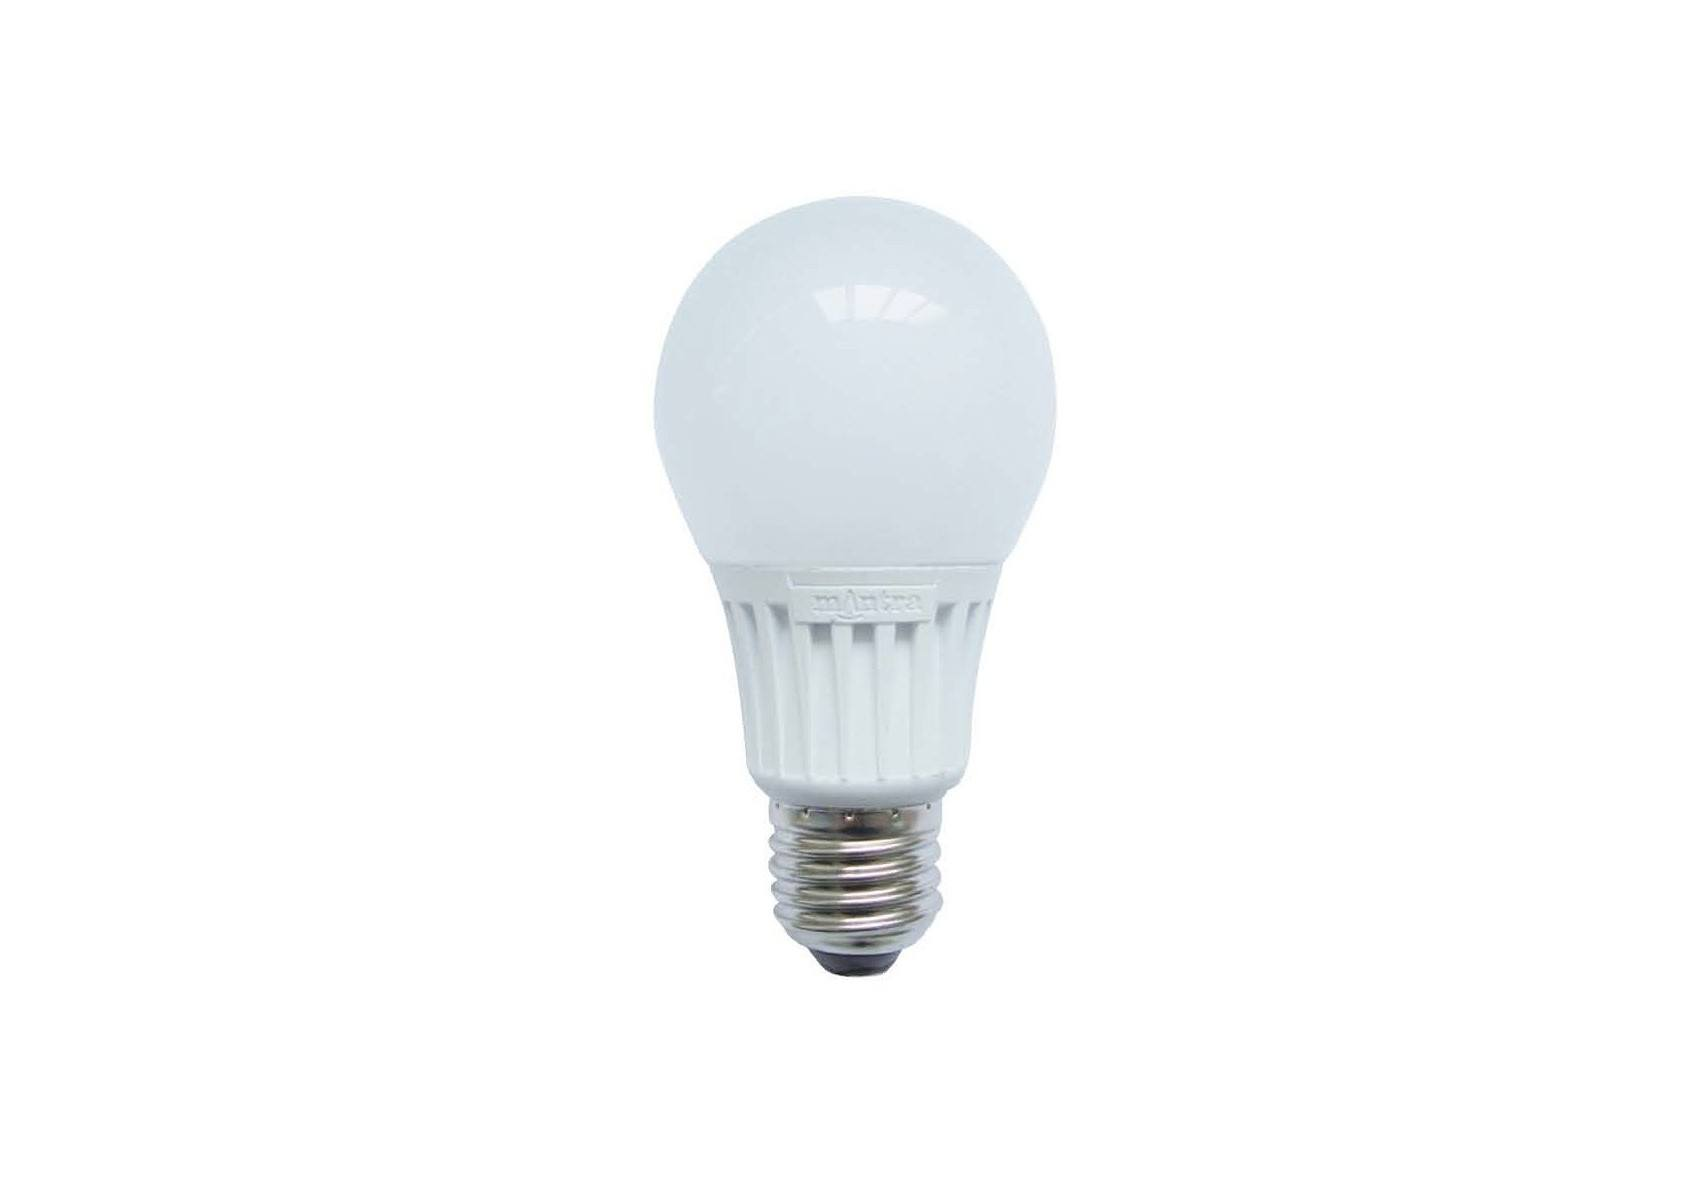 ampoule led e27 8w 823 lumens 3000k boite design. Black Bedroom Furniture Sets. Home Design Ideas